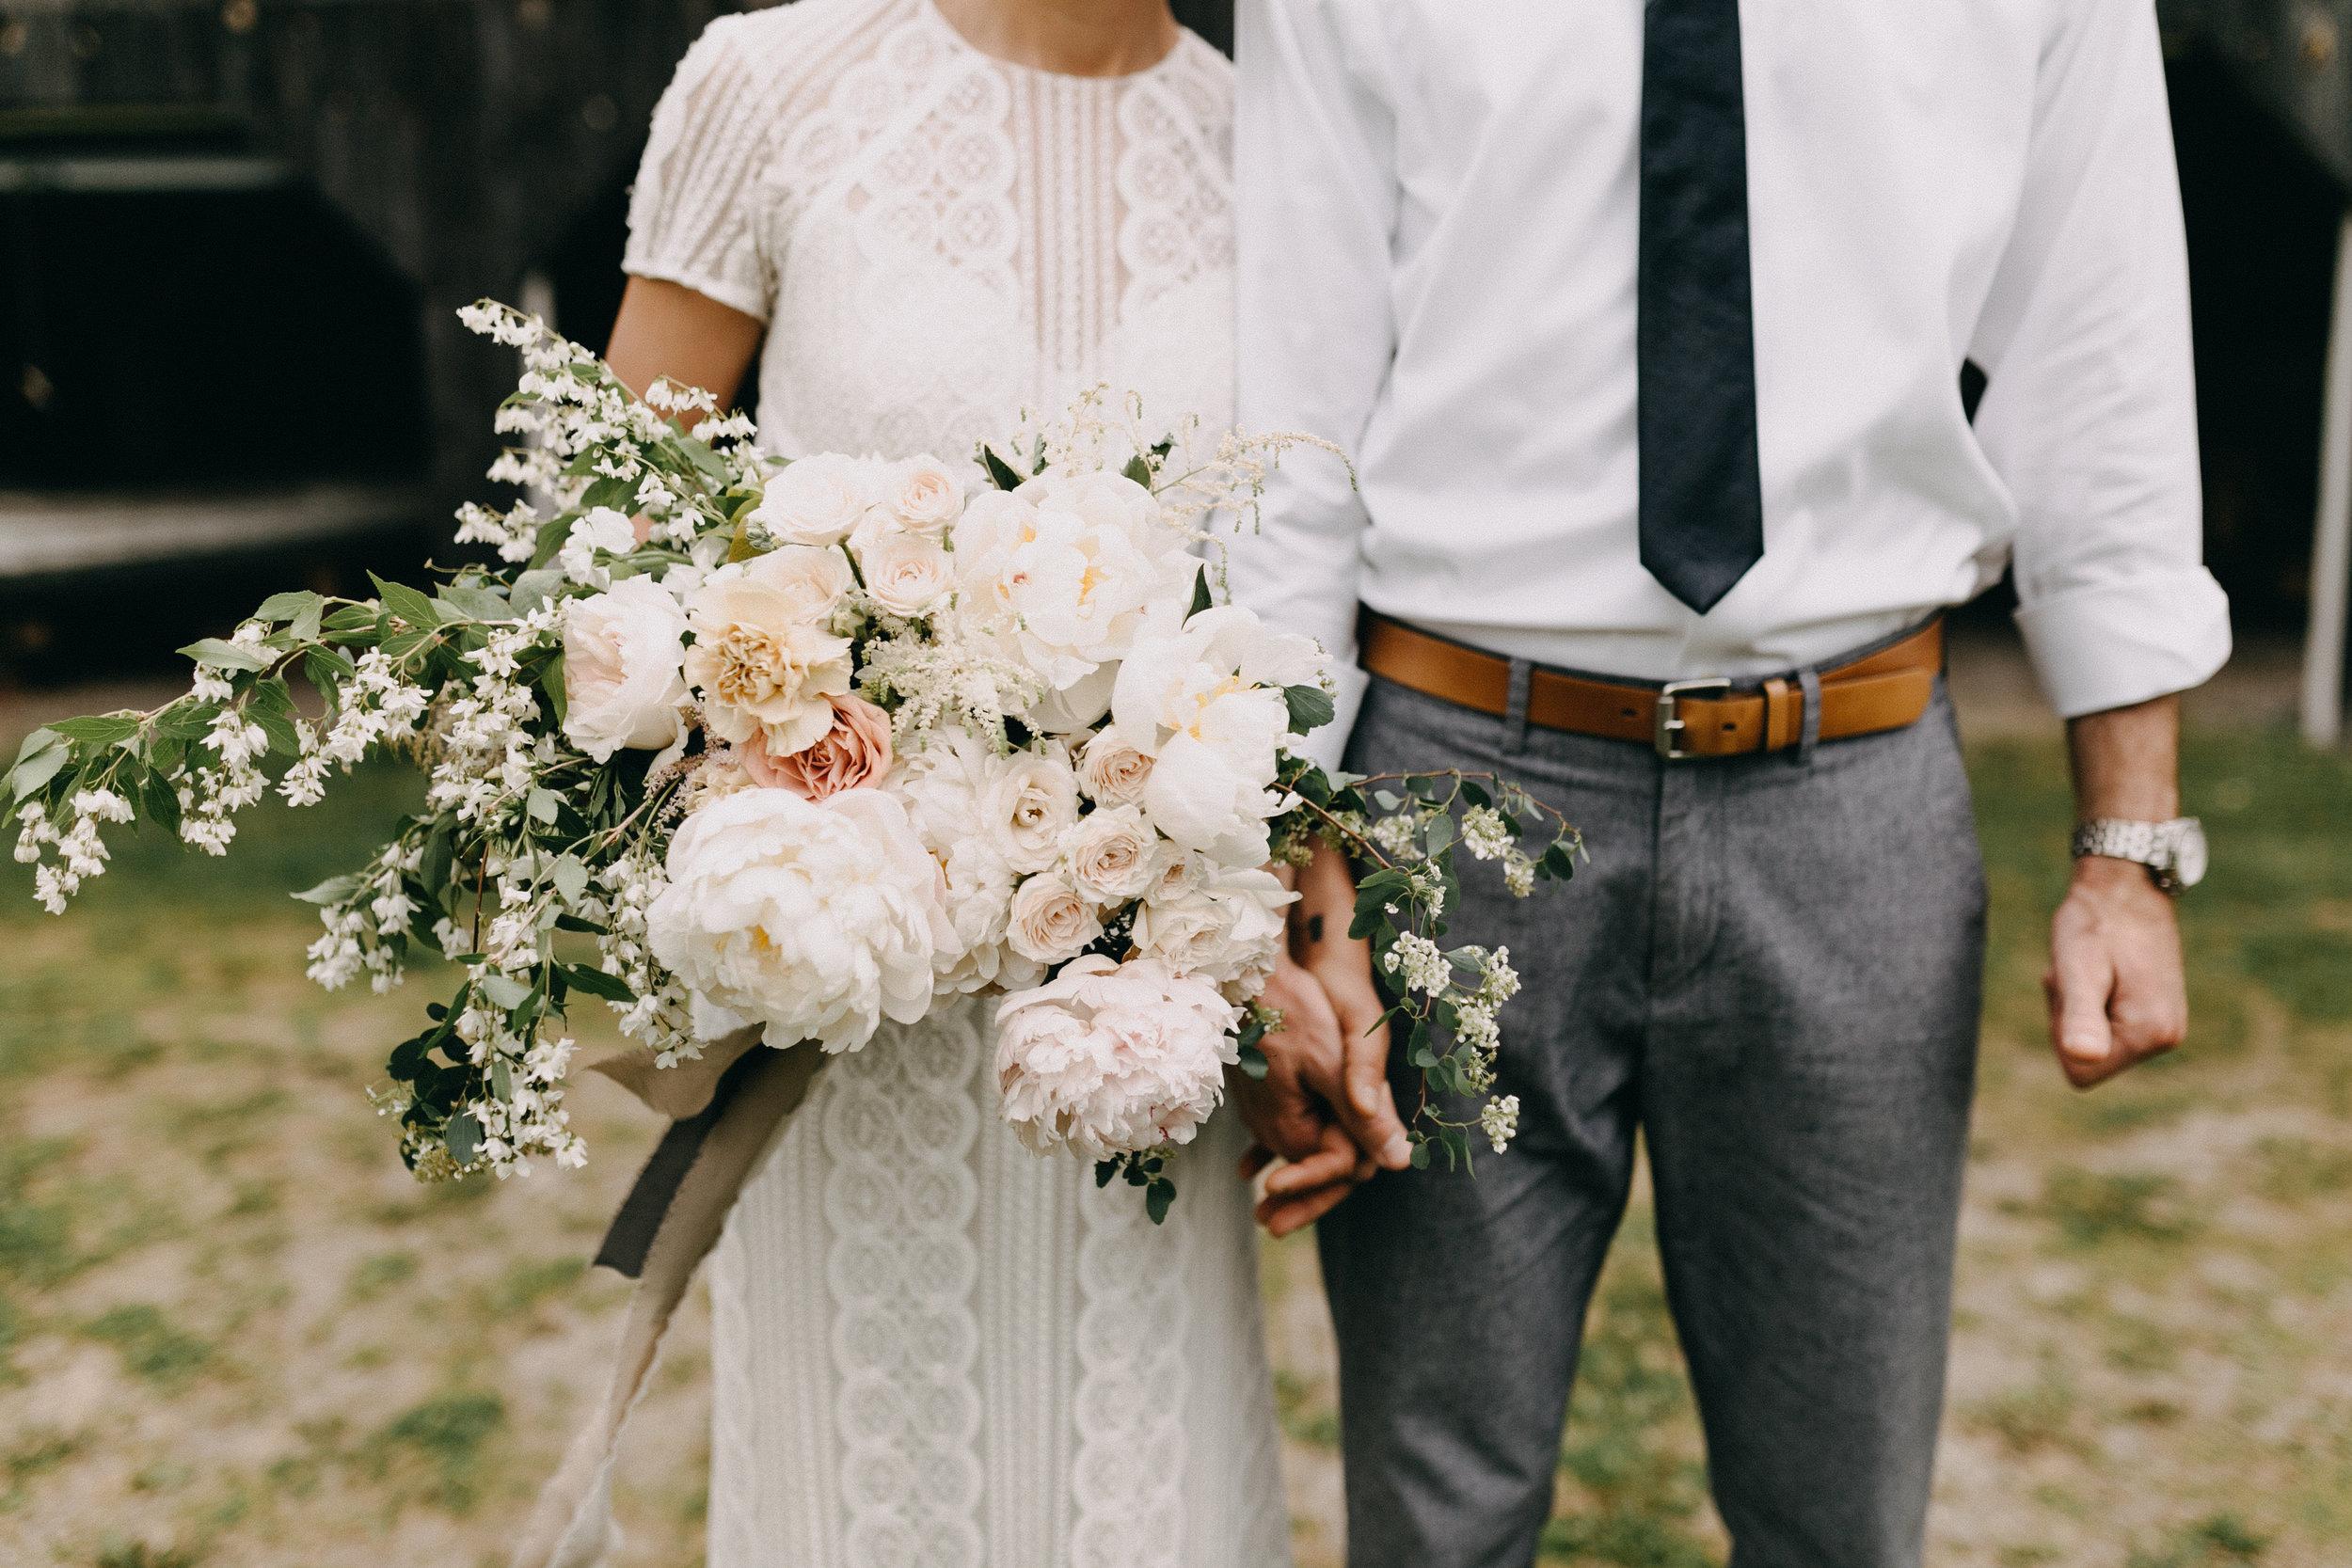 Watershed-Floral-Maine-Maritime-Wedding-Bridal-Bouquet-Centerpieces-0260.jpg